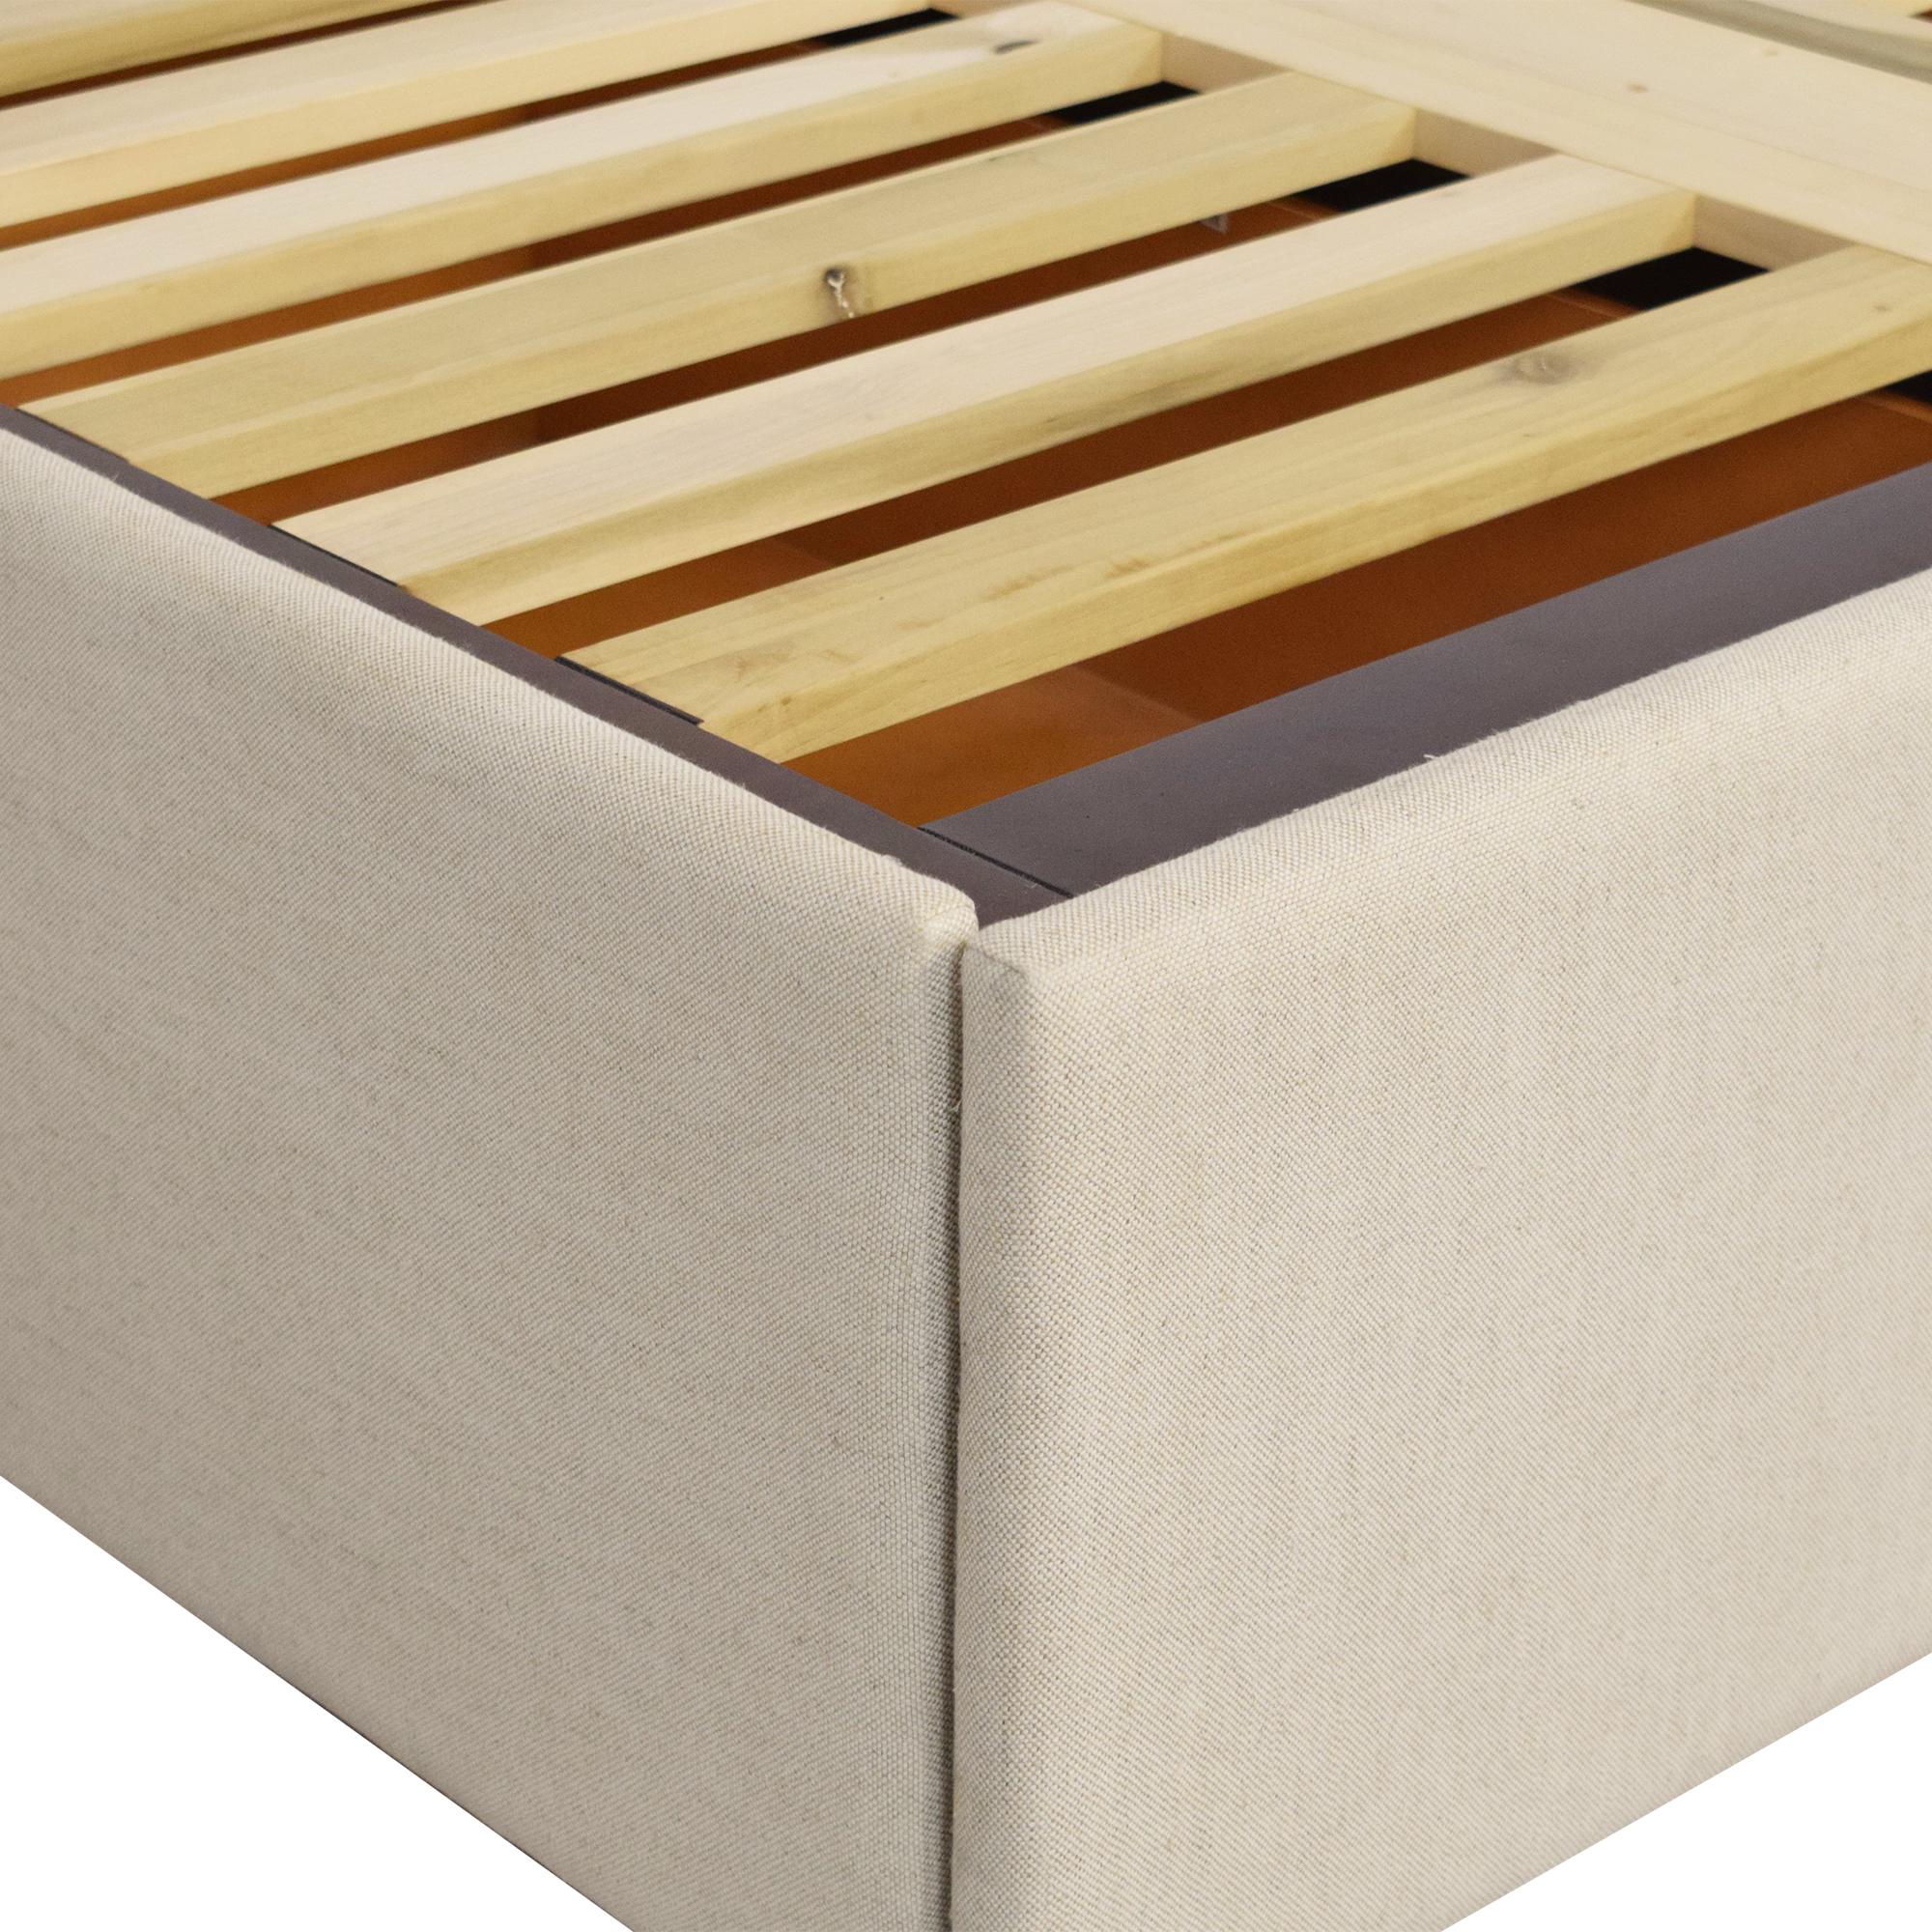 Pottery Barn Pottery Barn Upholstered Side Storage Full Platform Bed dimensions